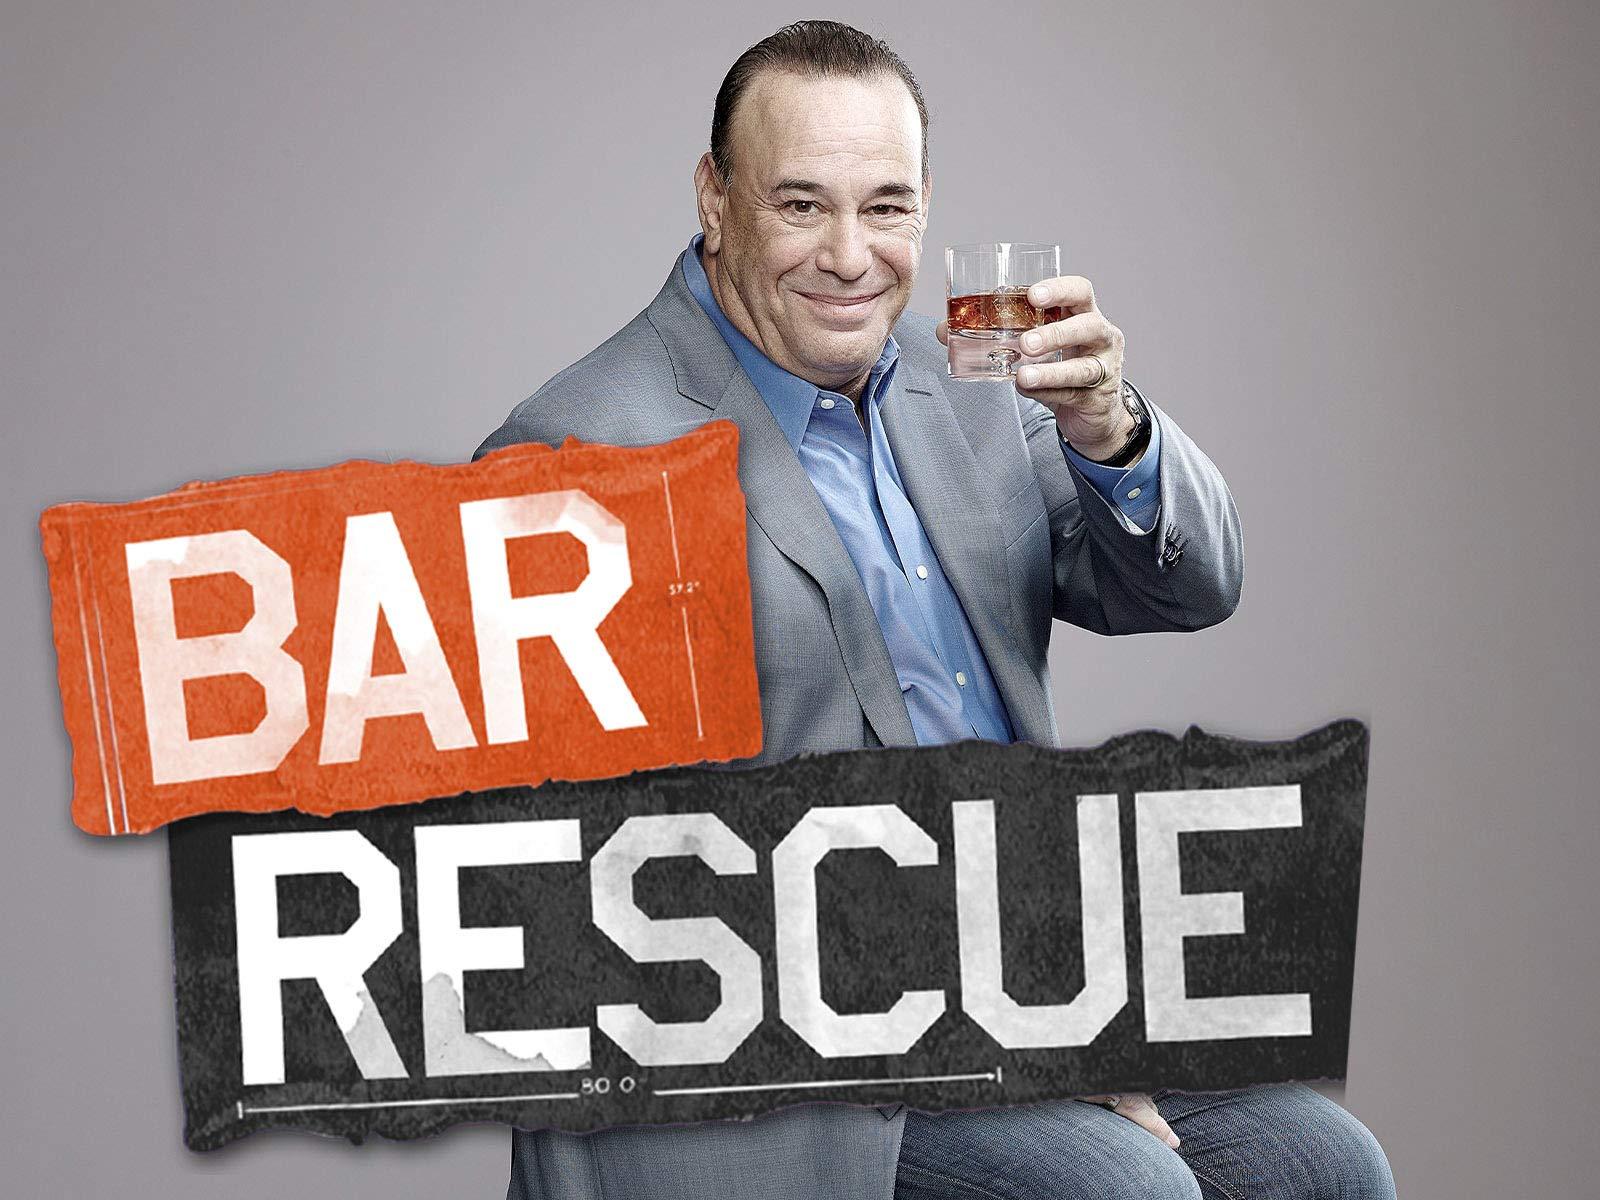 Bar Rescue - Season 5